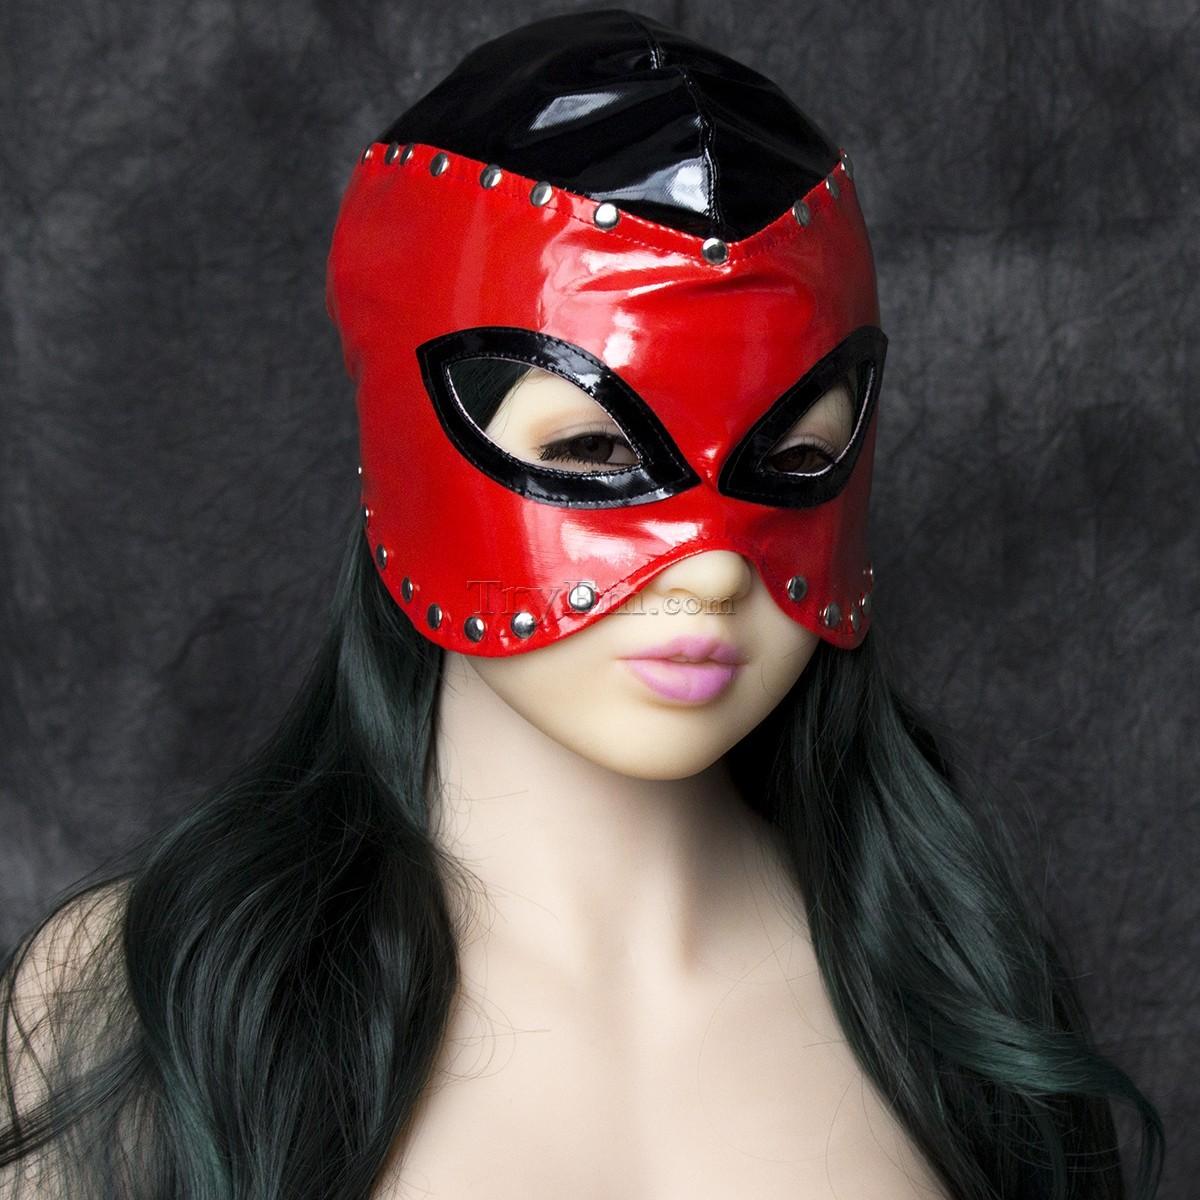 13-Masked-Queen-Cap-1.jpg